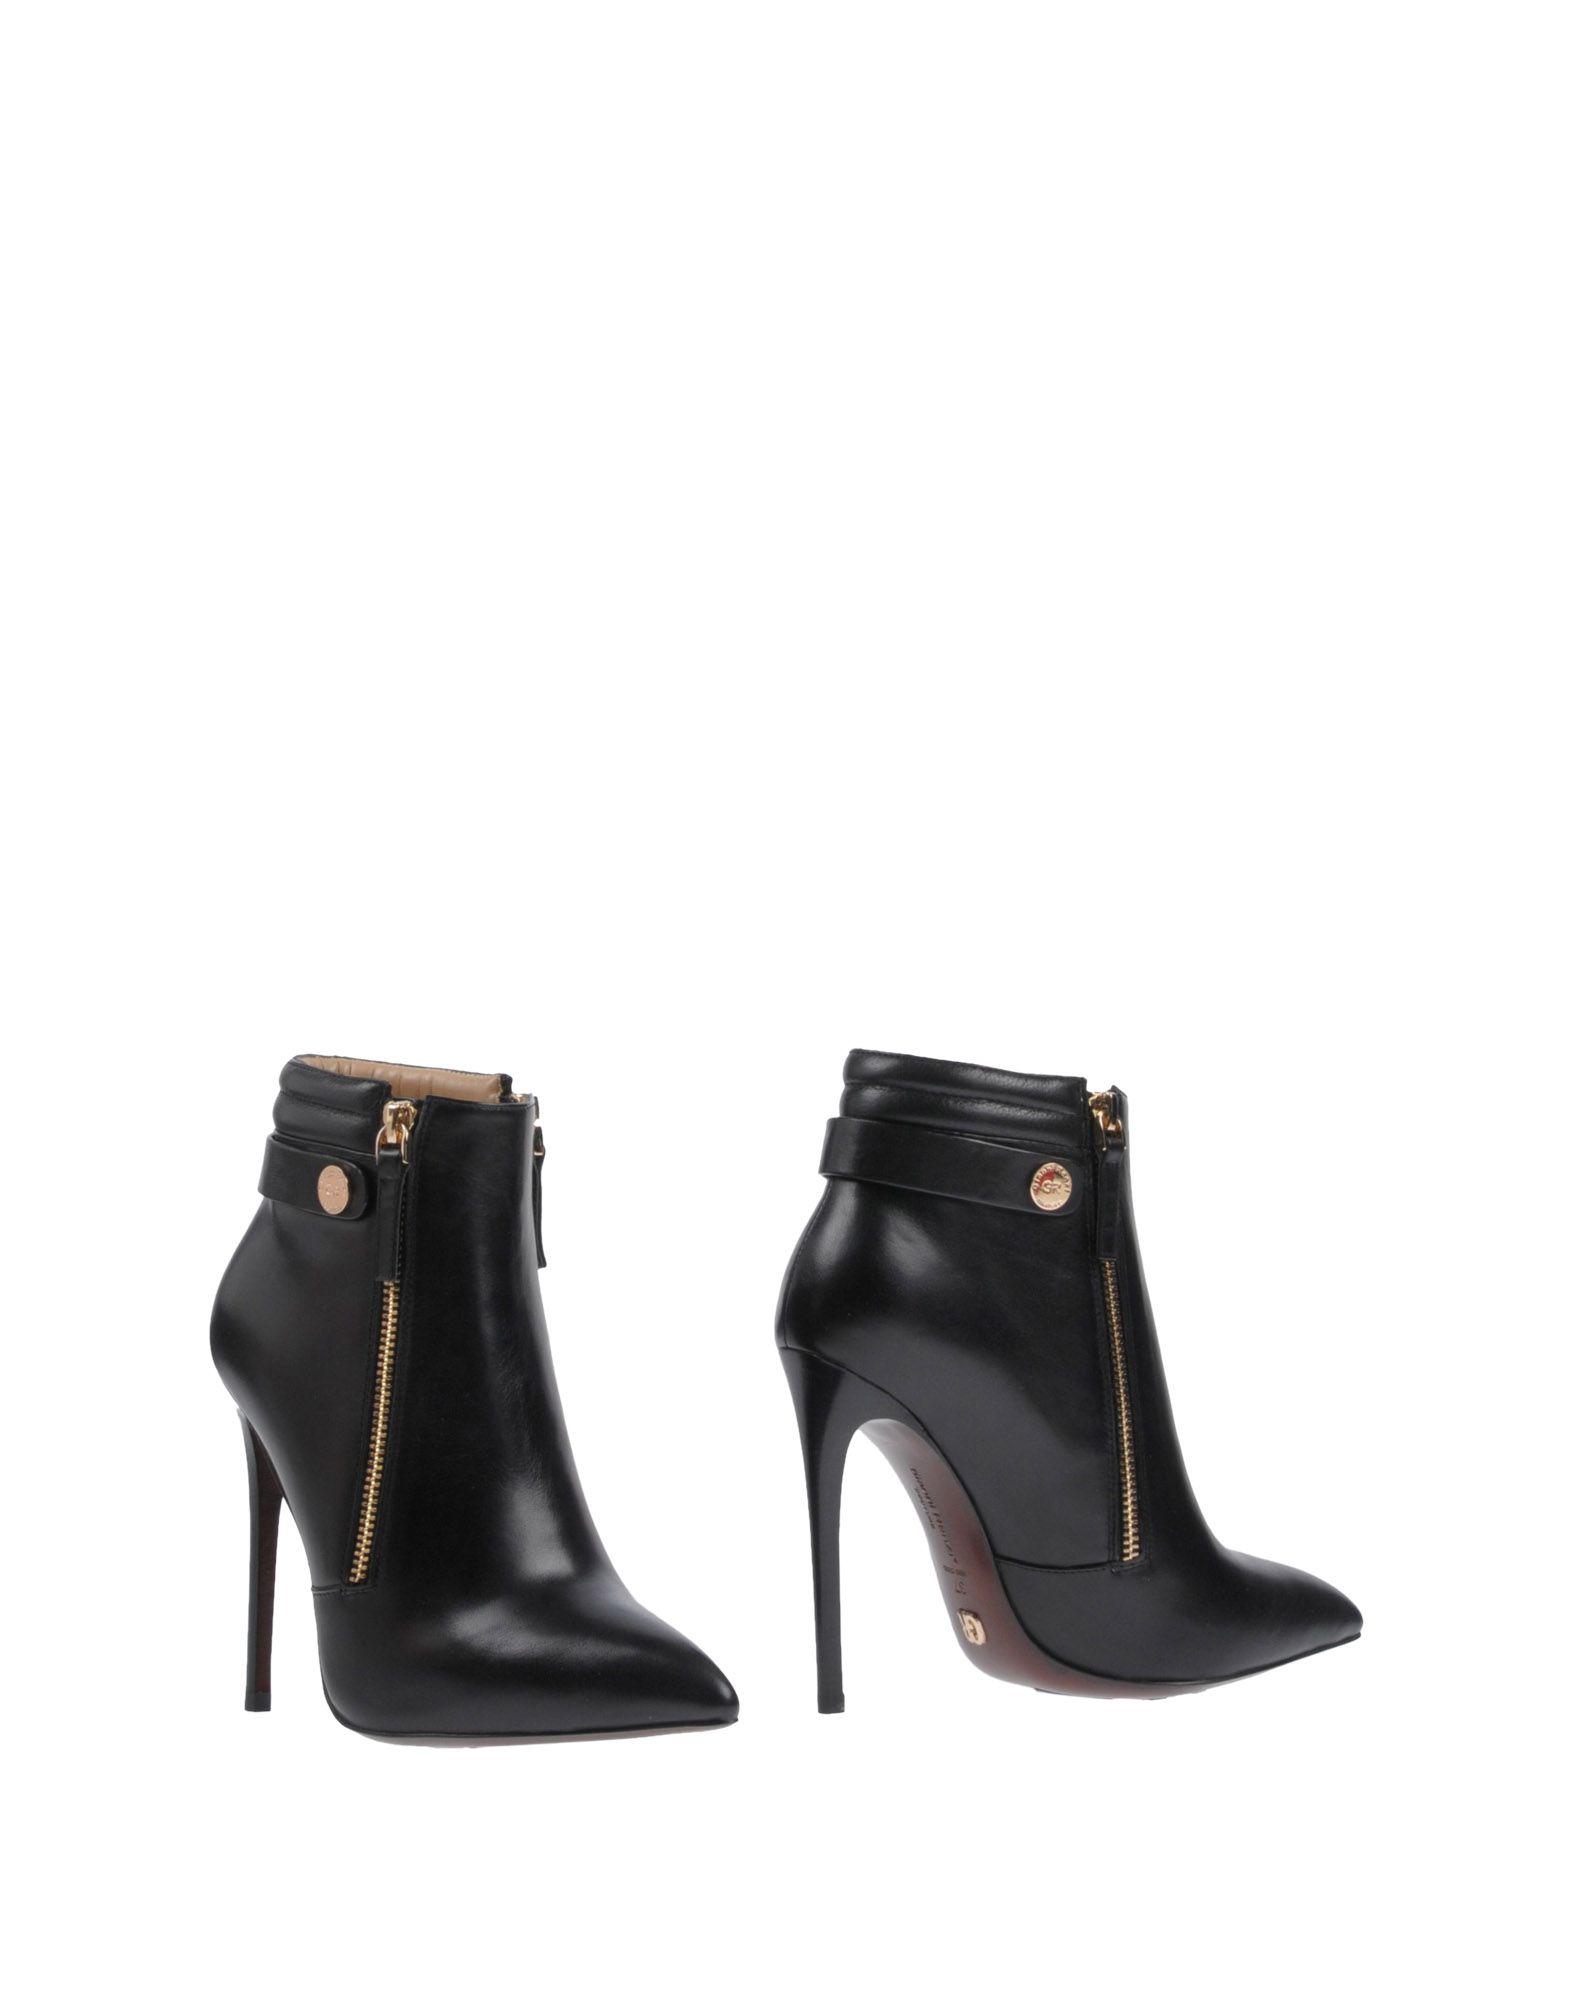 Gianni Renzi® -  Couture Ankle Boot - Renzi® Women Gianni Renzi®  Couture Ankle Boots online on  Australia - 11455156OX 07cd94